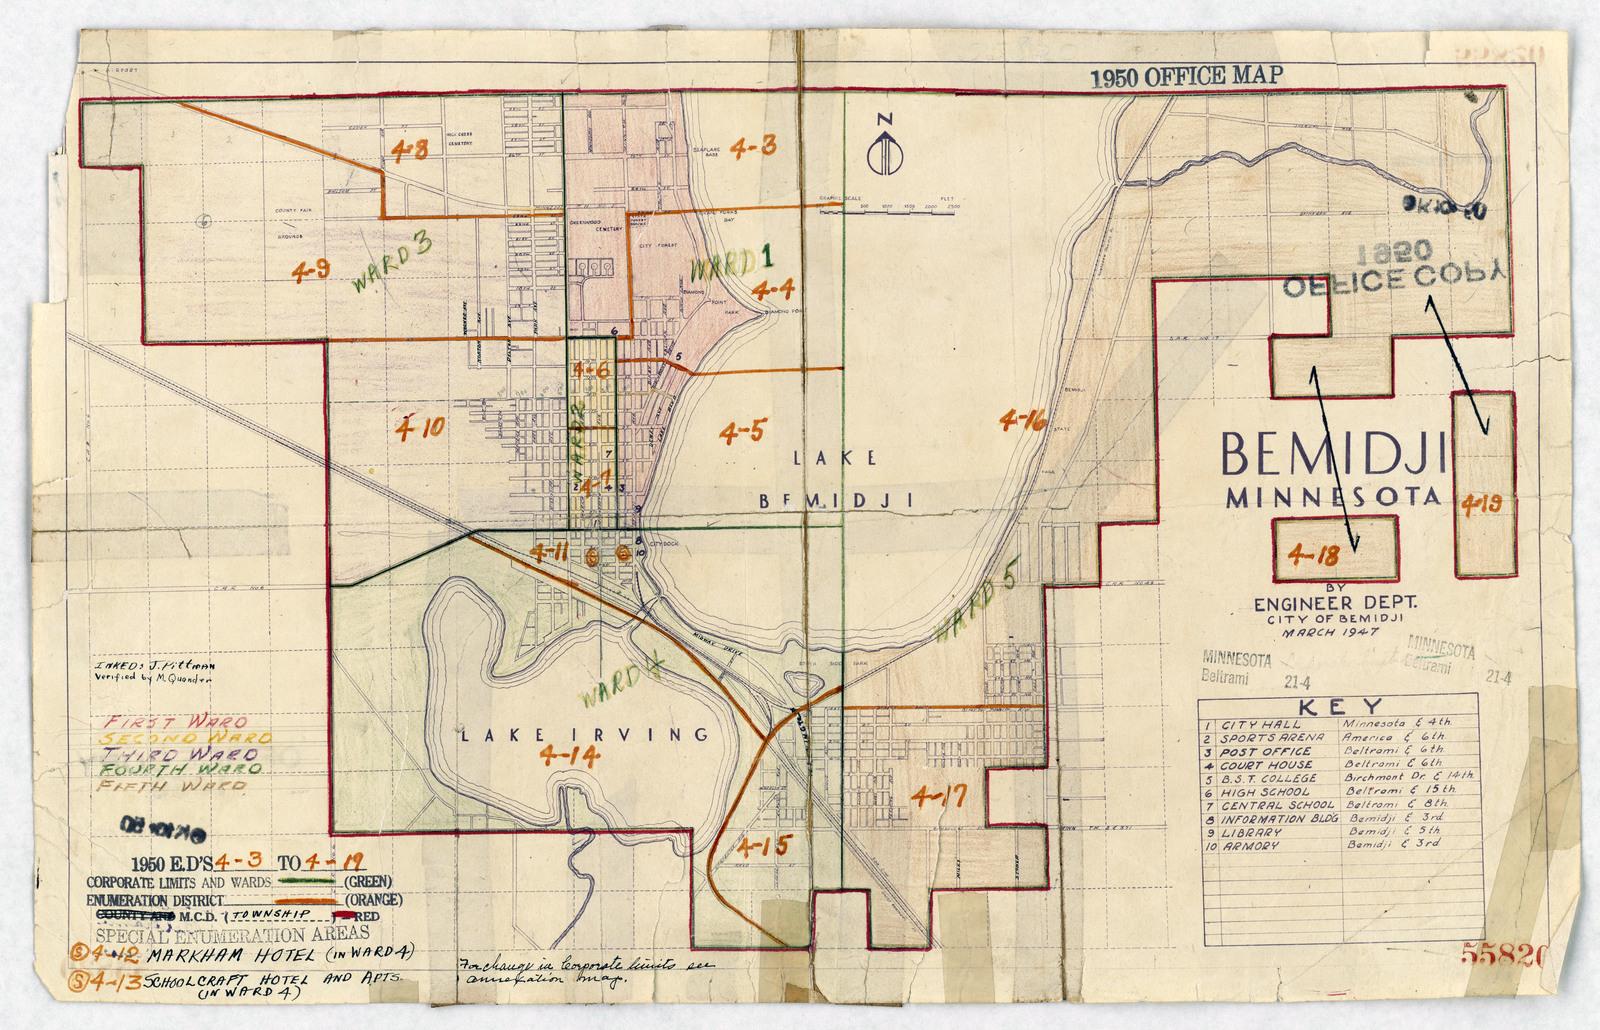 Bemidji Minnesota Map.1950 Census Enumeration District Maps Minnesota Mn Beltrami